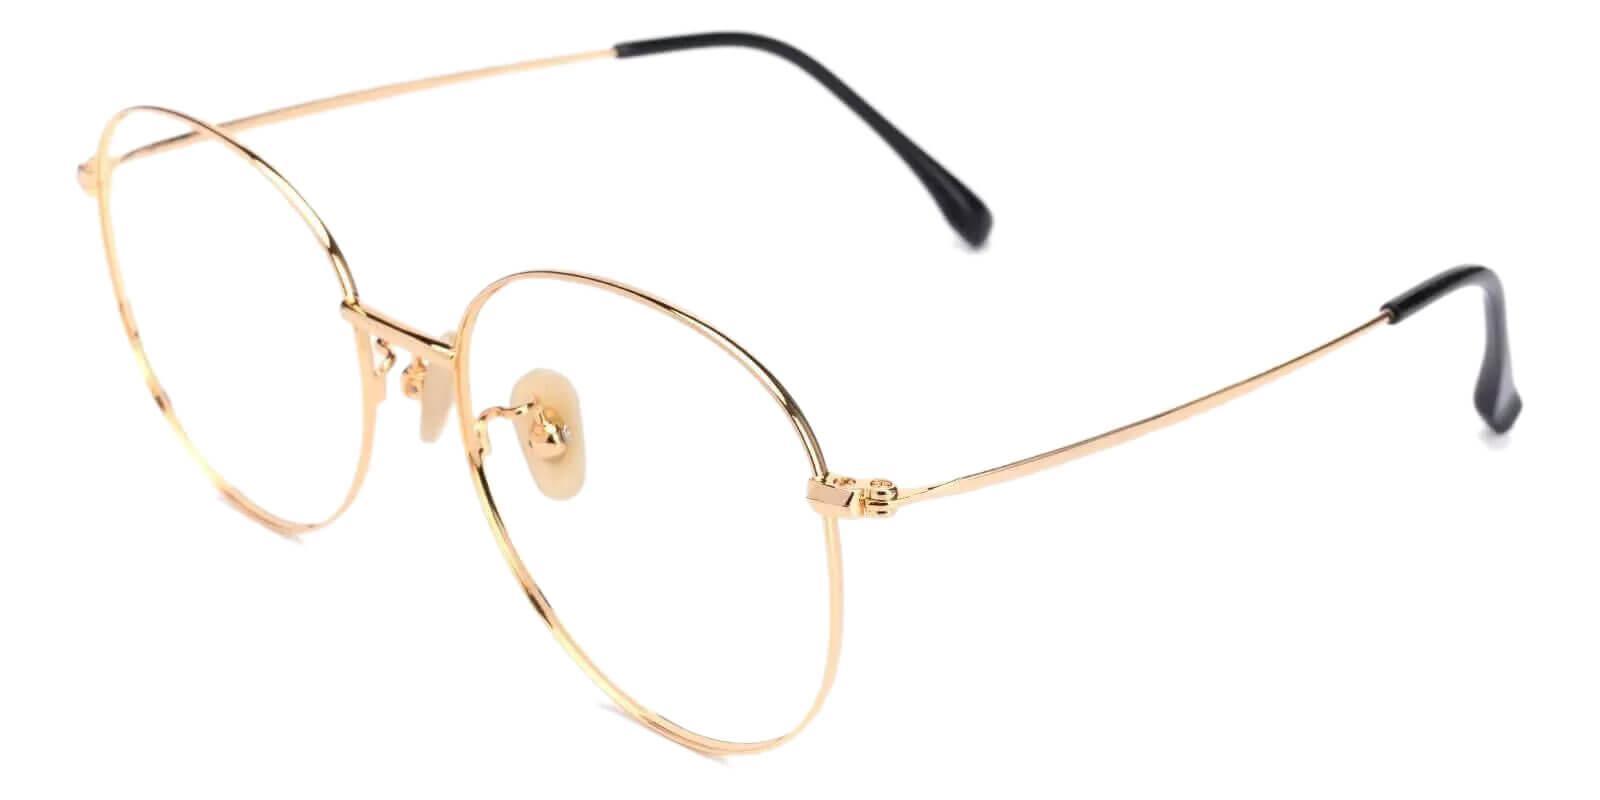 Mongolia Gold Titanium Eyeglasses , Lightweight , NosePads Frames from ABBE Glasses